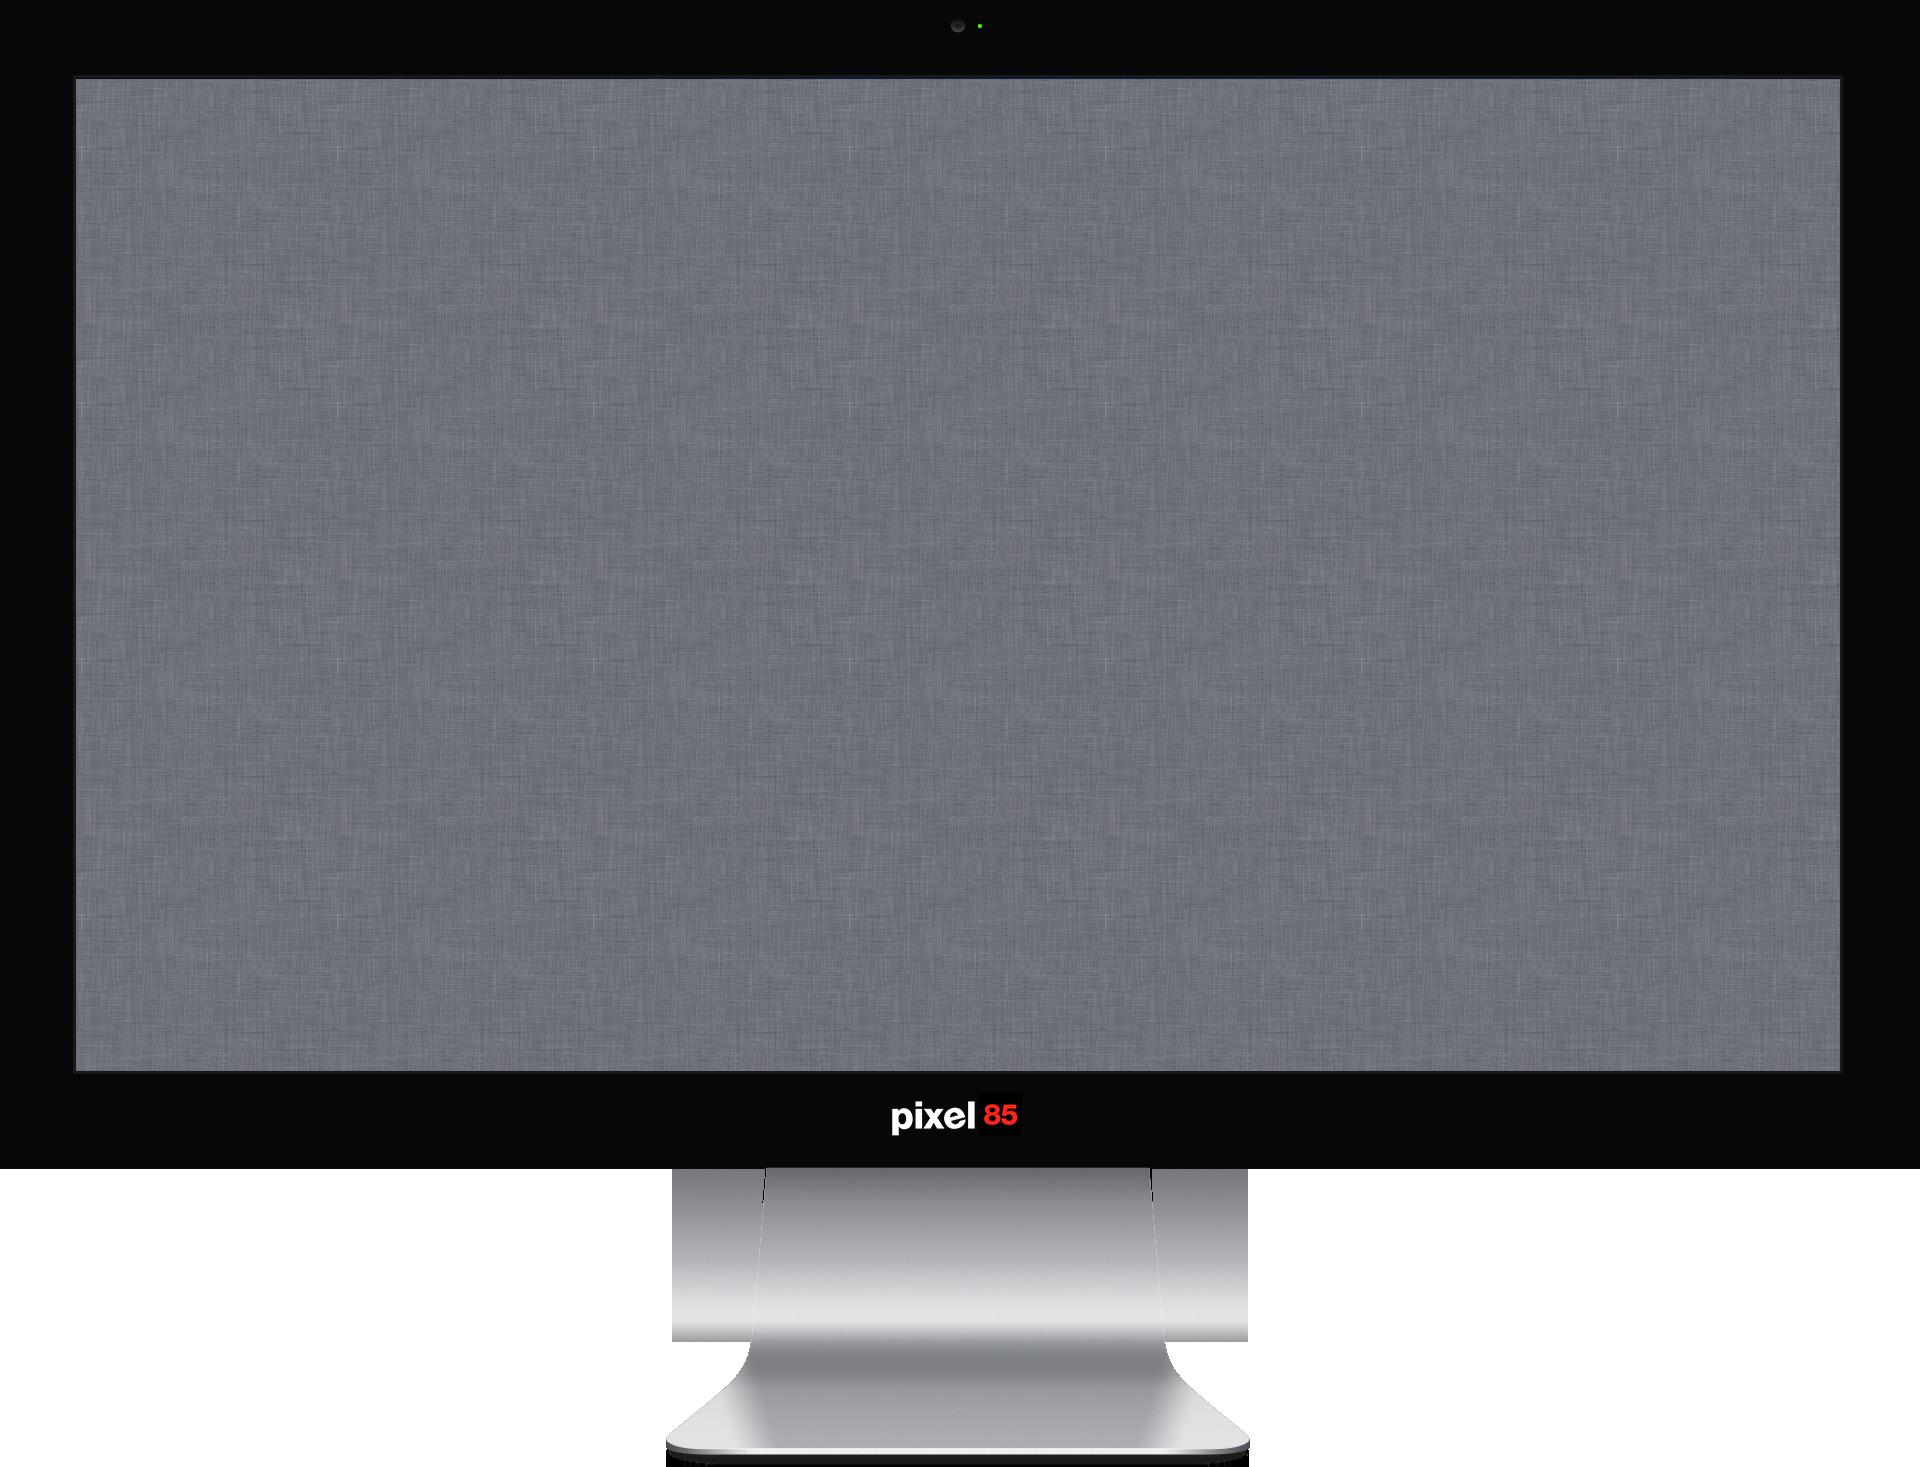 Monitor PNG Image.